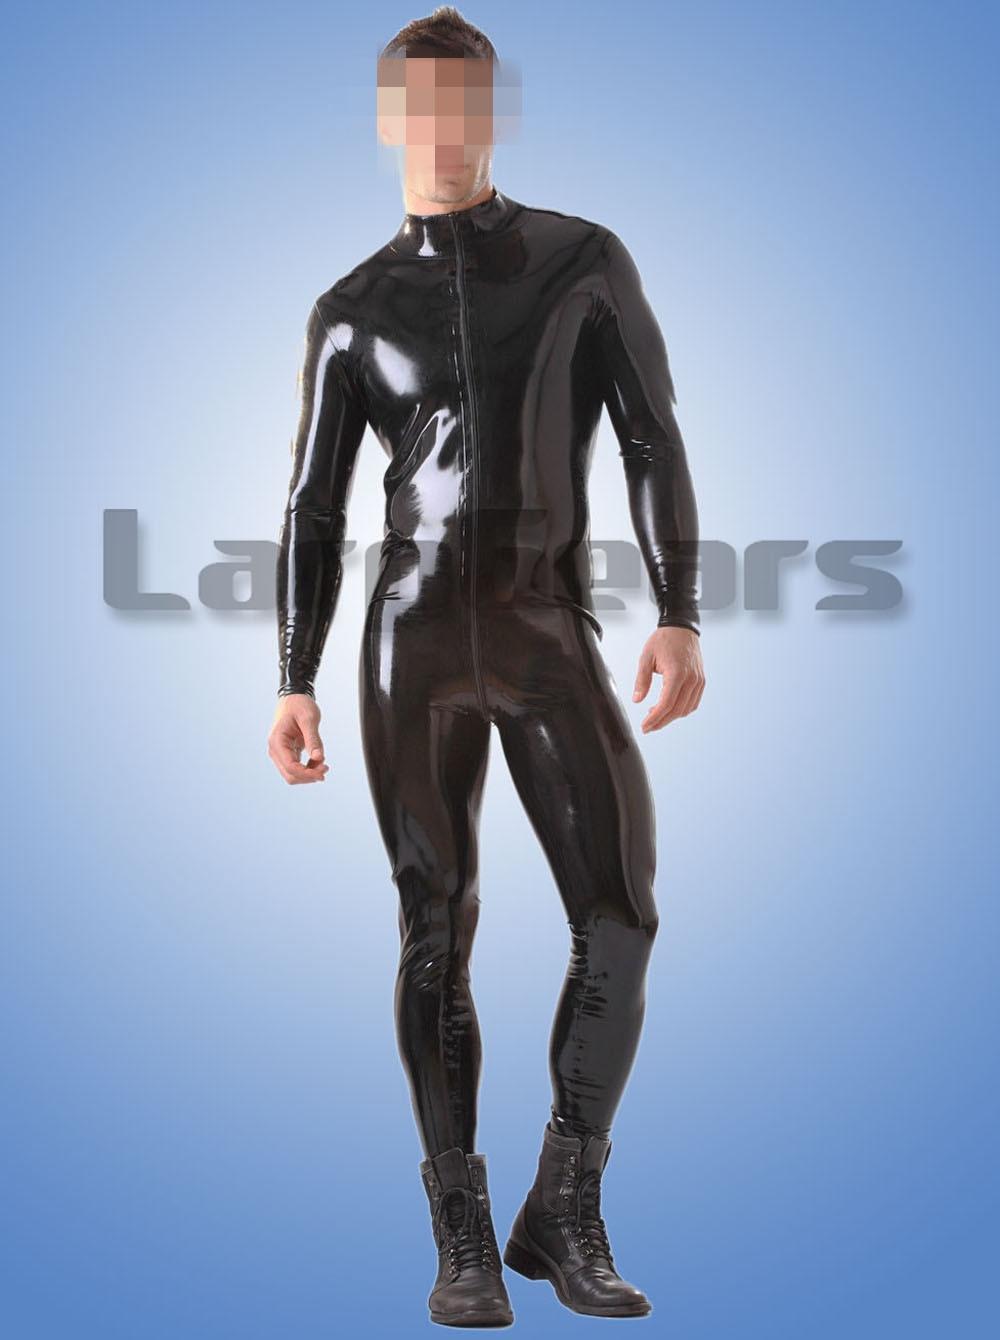 все цены на 100% Latex Rubber Gummi Zentai Catsuit 0.4mm Fetish Man Latex Bodysuit Suit Wear онлайн